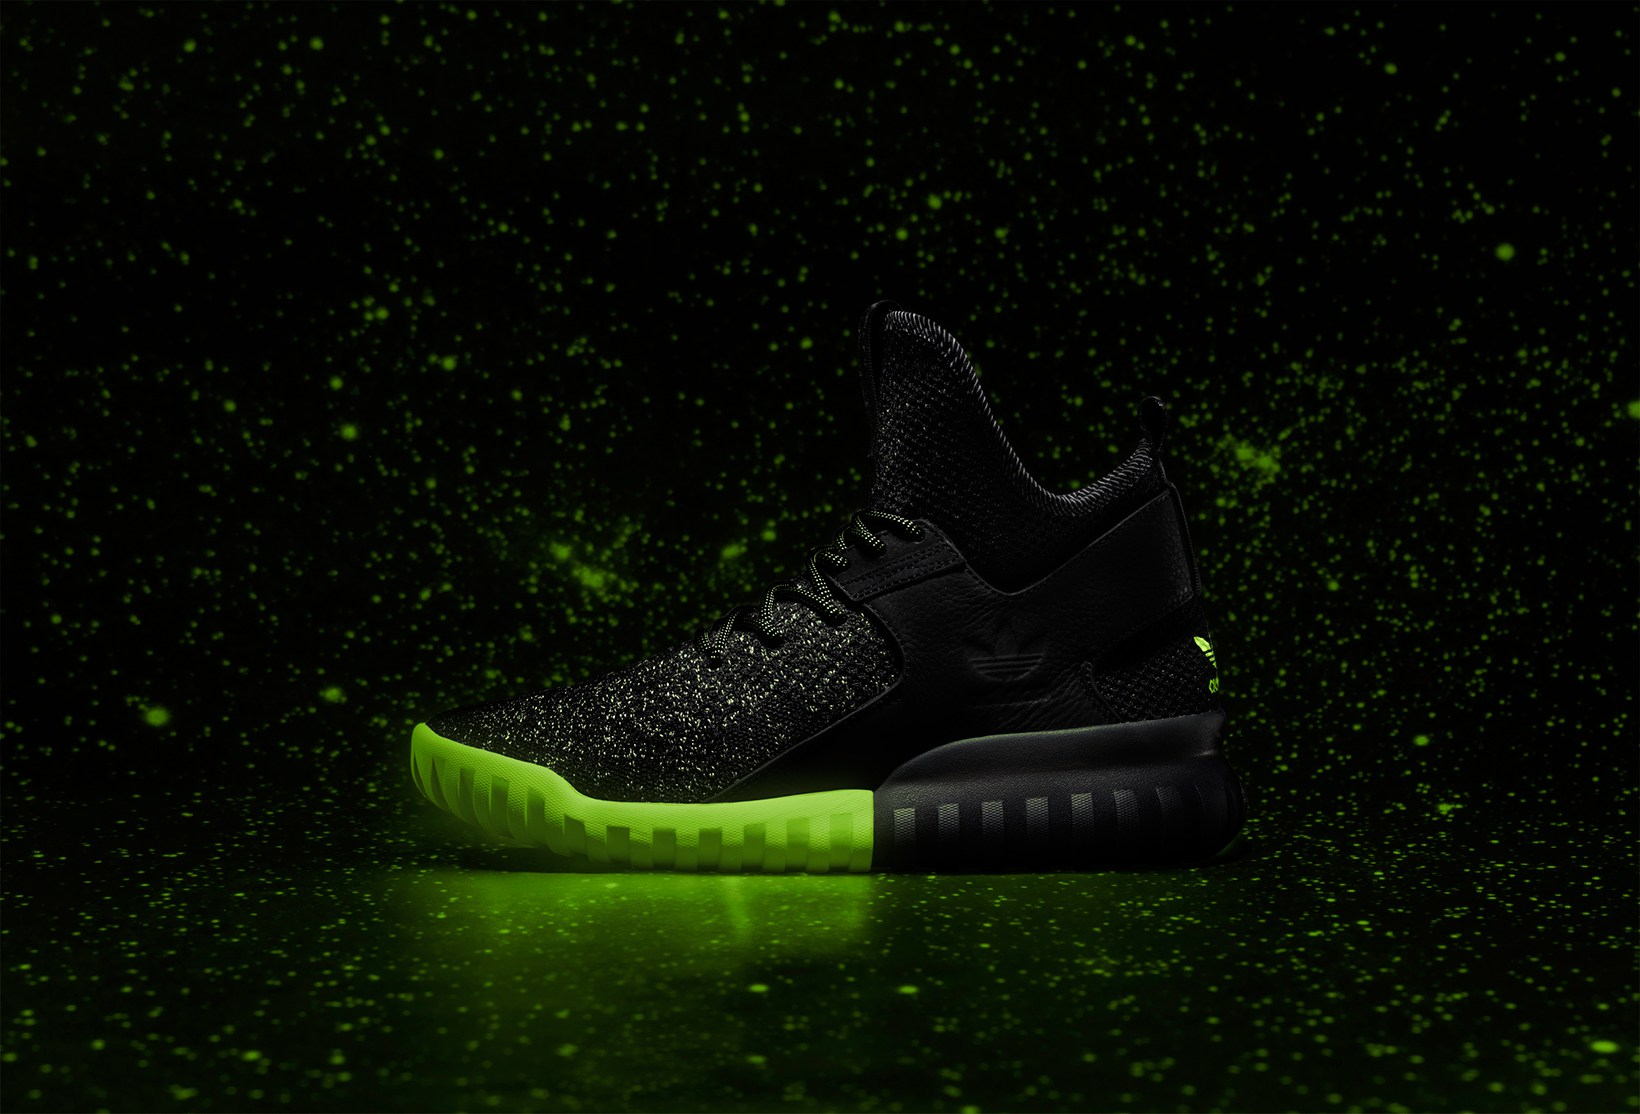 Une édition lumineuse de l'Adidas Tubular Primeknit